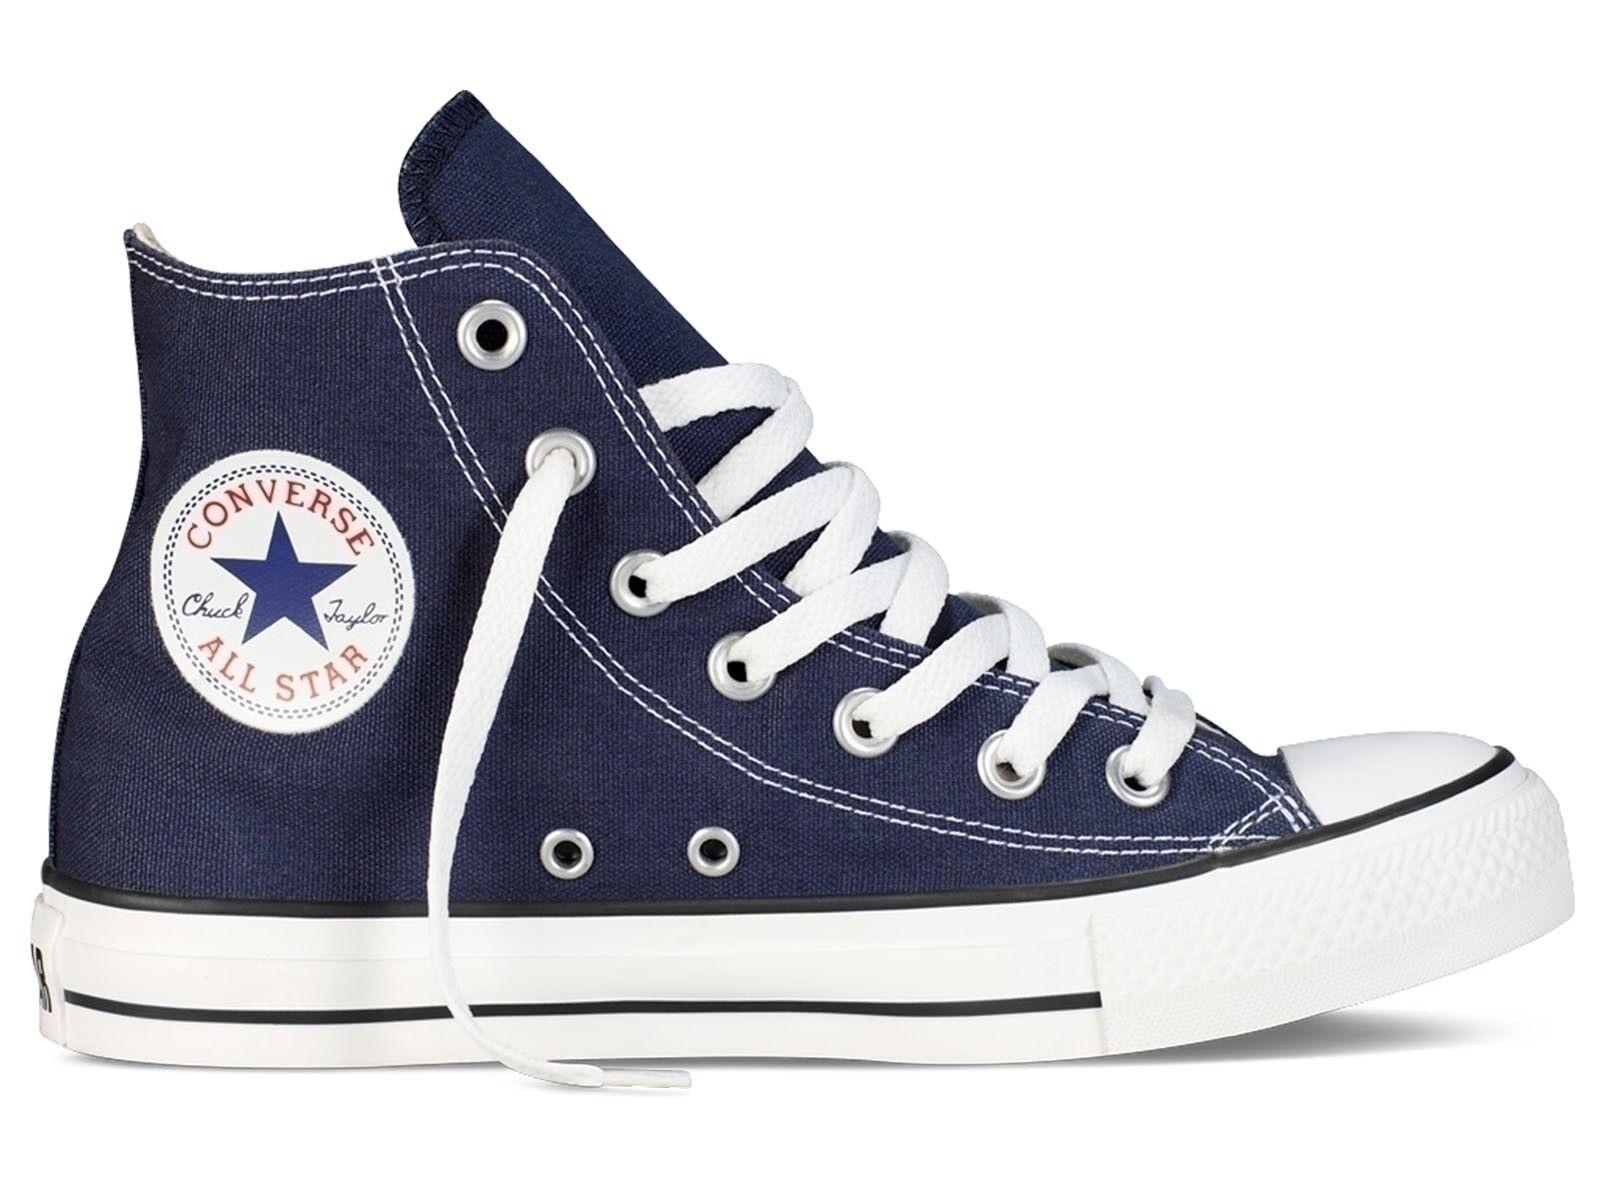 zapatos UNISEX CONVERSE ESTATE ESTATE ESTATE M9622C ALL STAR HI NAVY  comprar barato